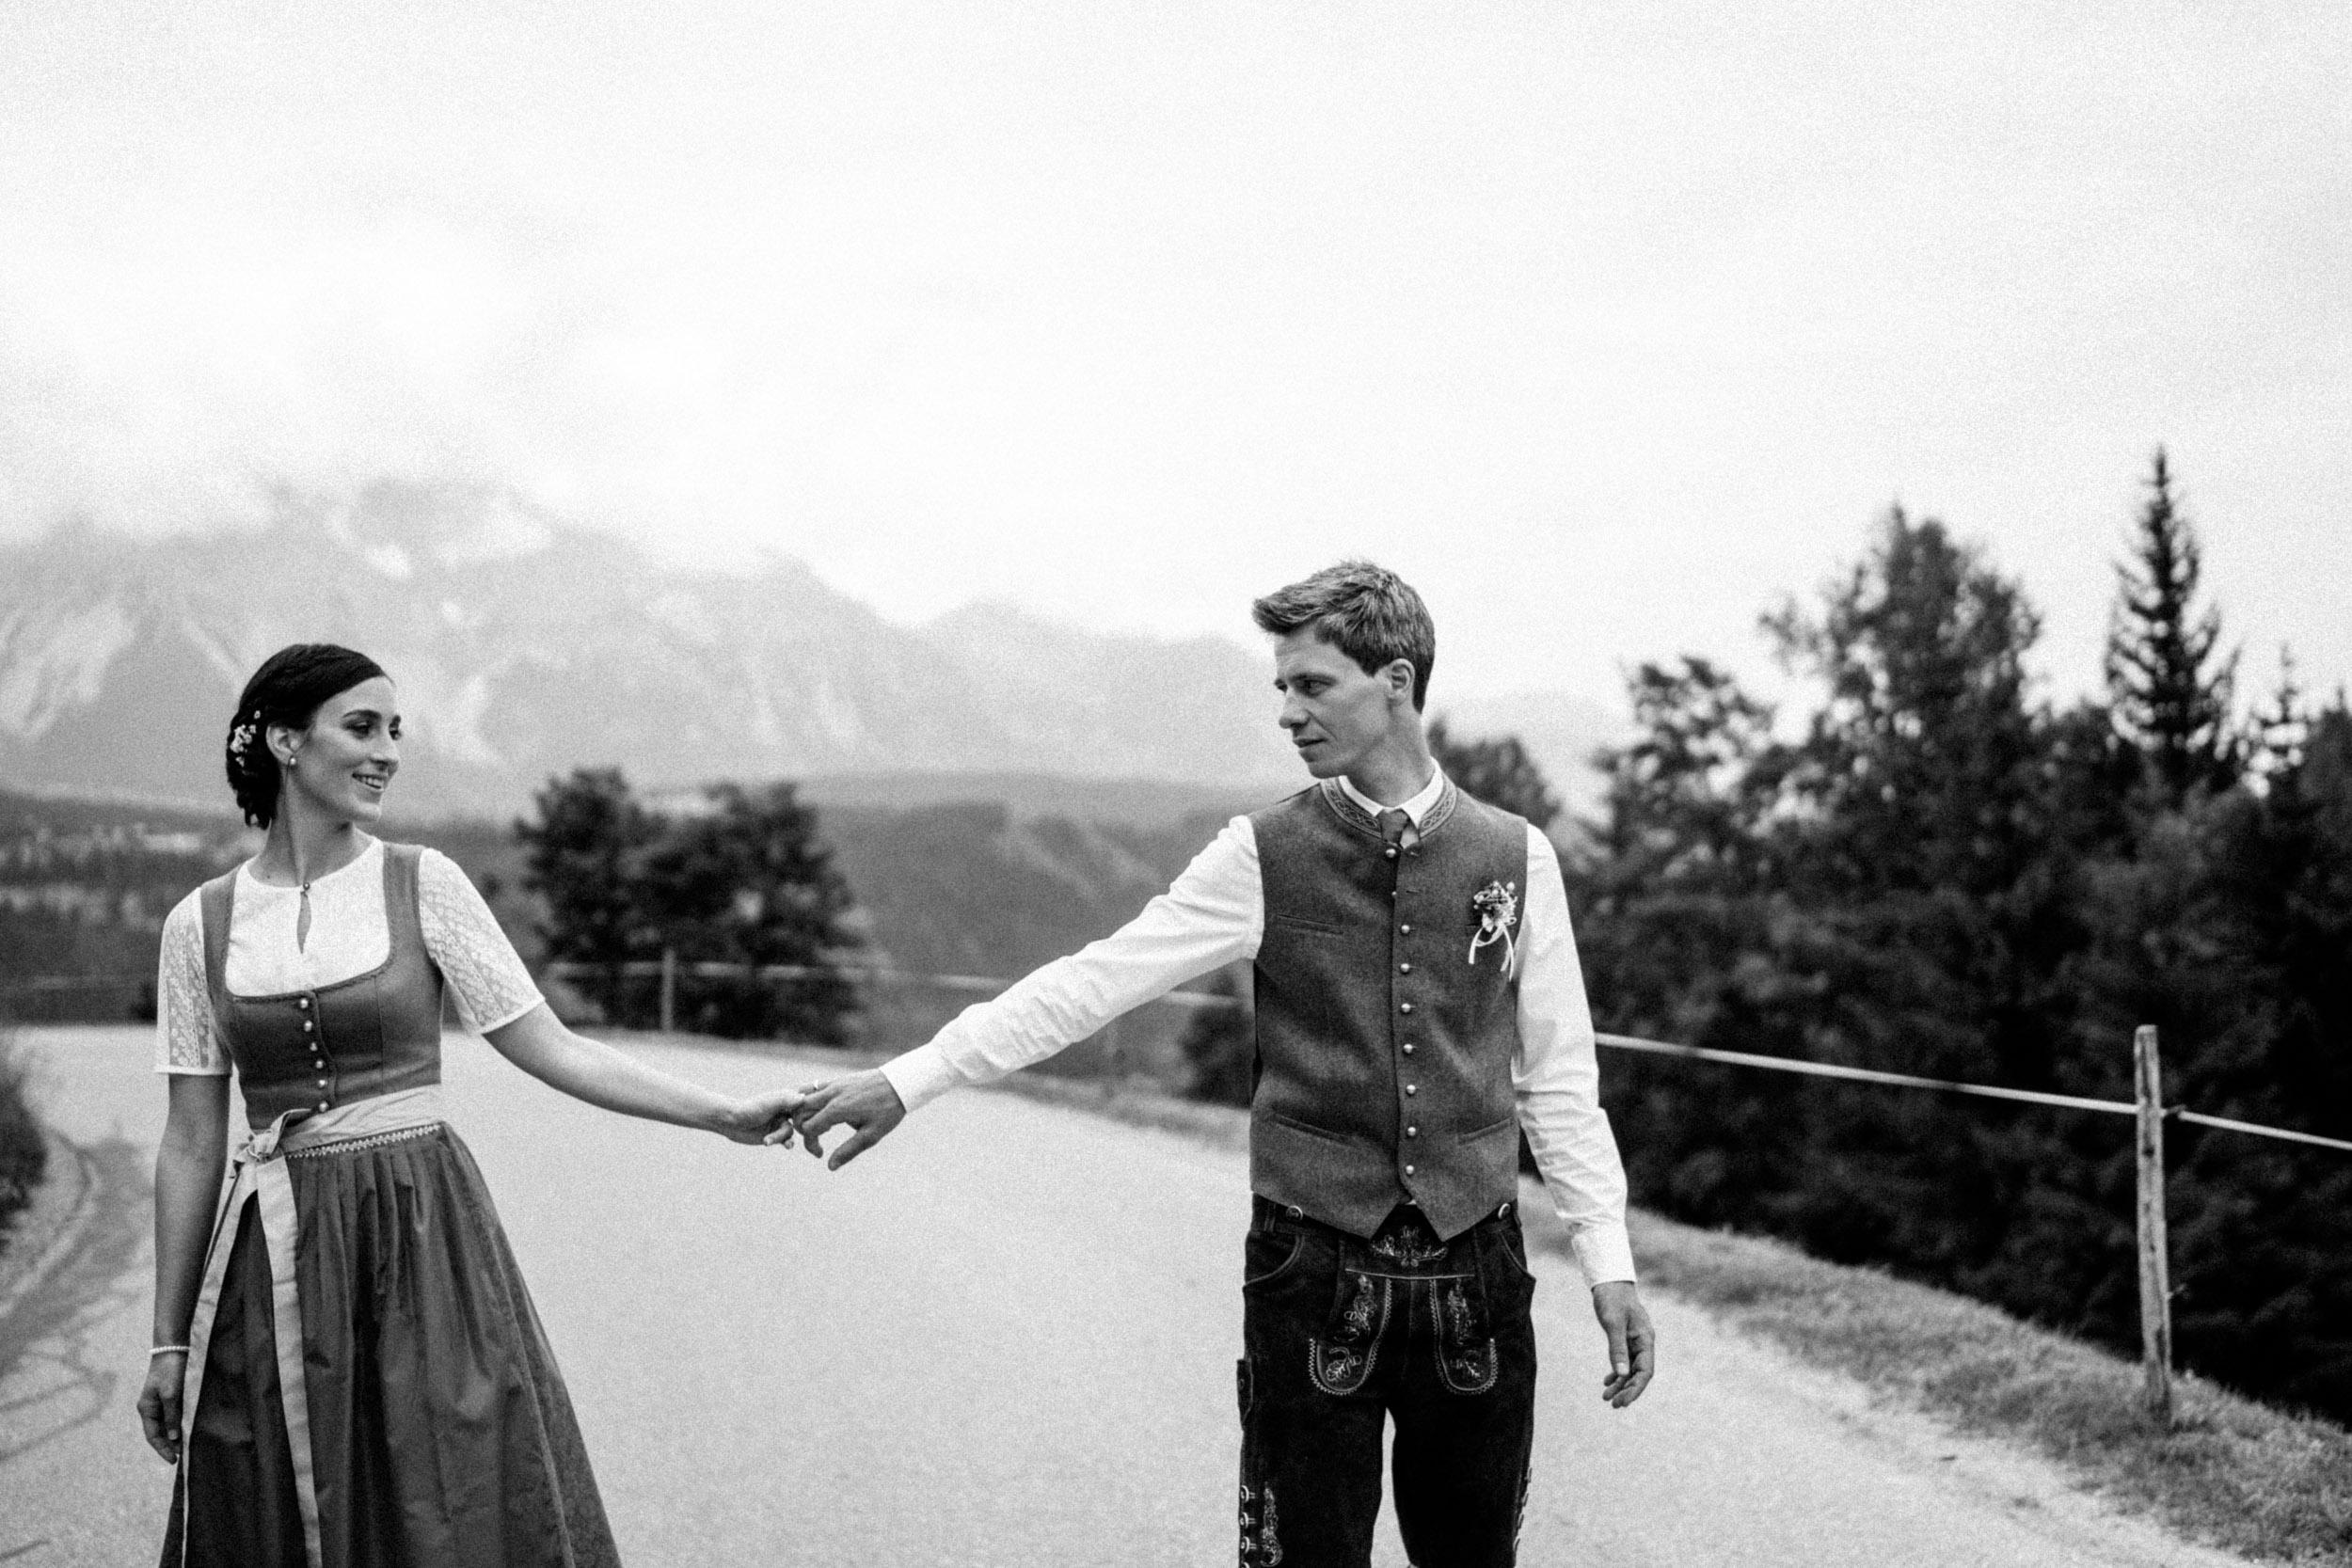 austria_mountain_wedding_photography_countryside_vienna-12.jpg